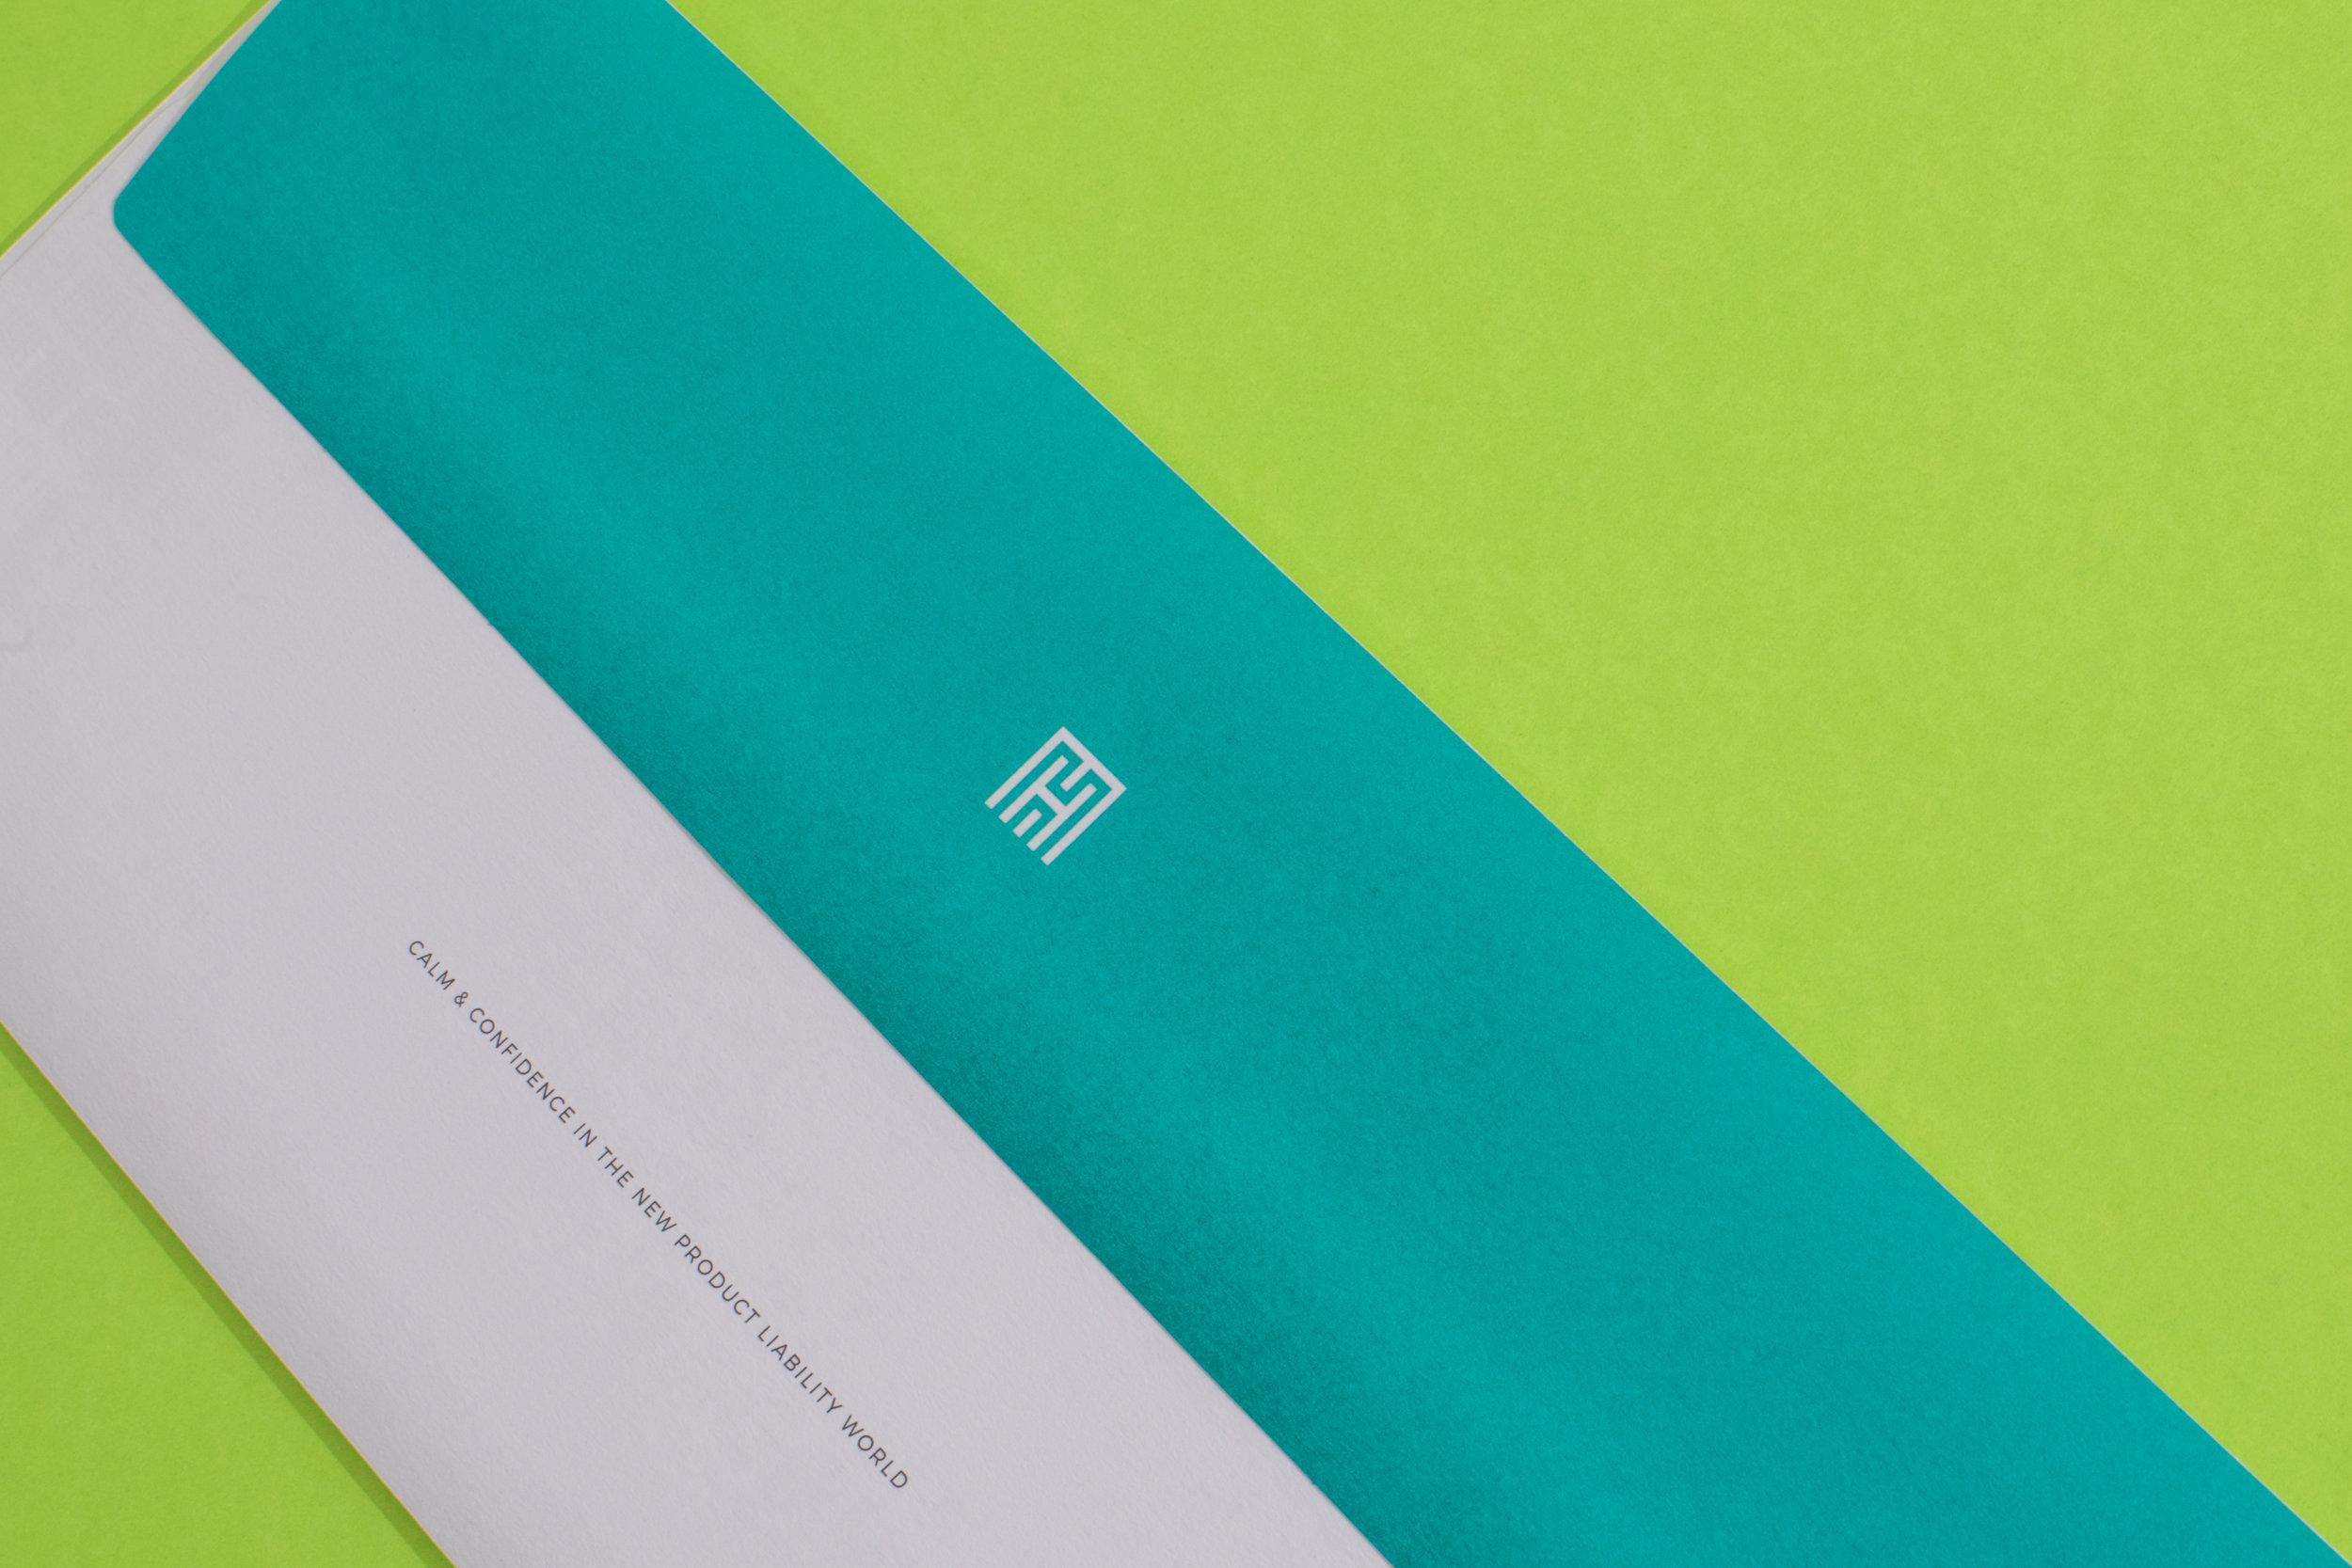 WUA_Print_Materials-42.jpg